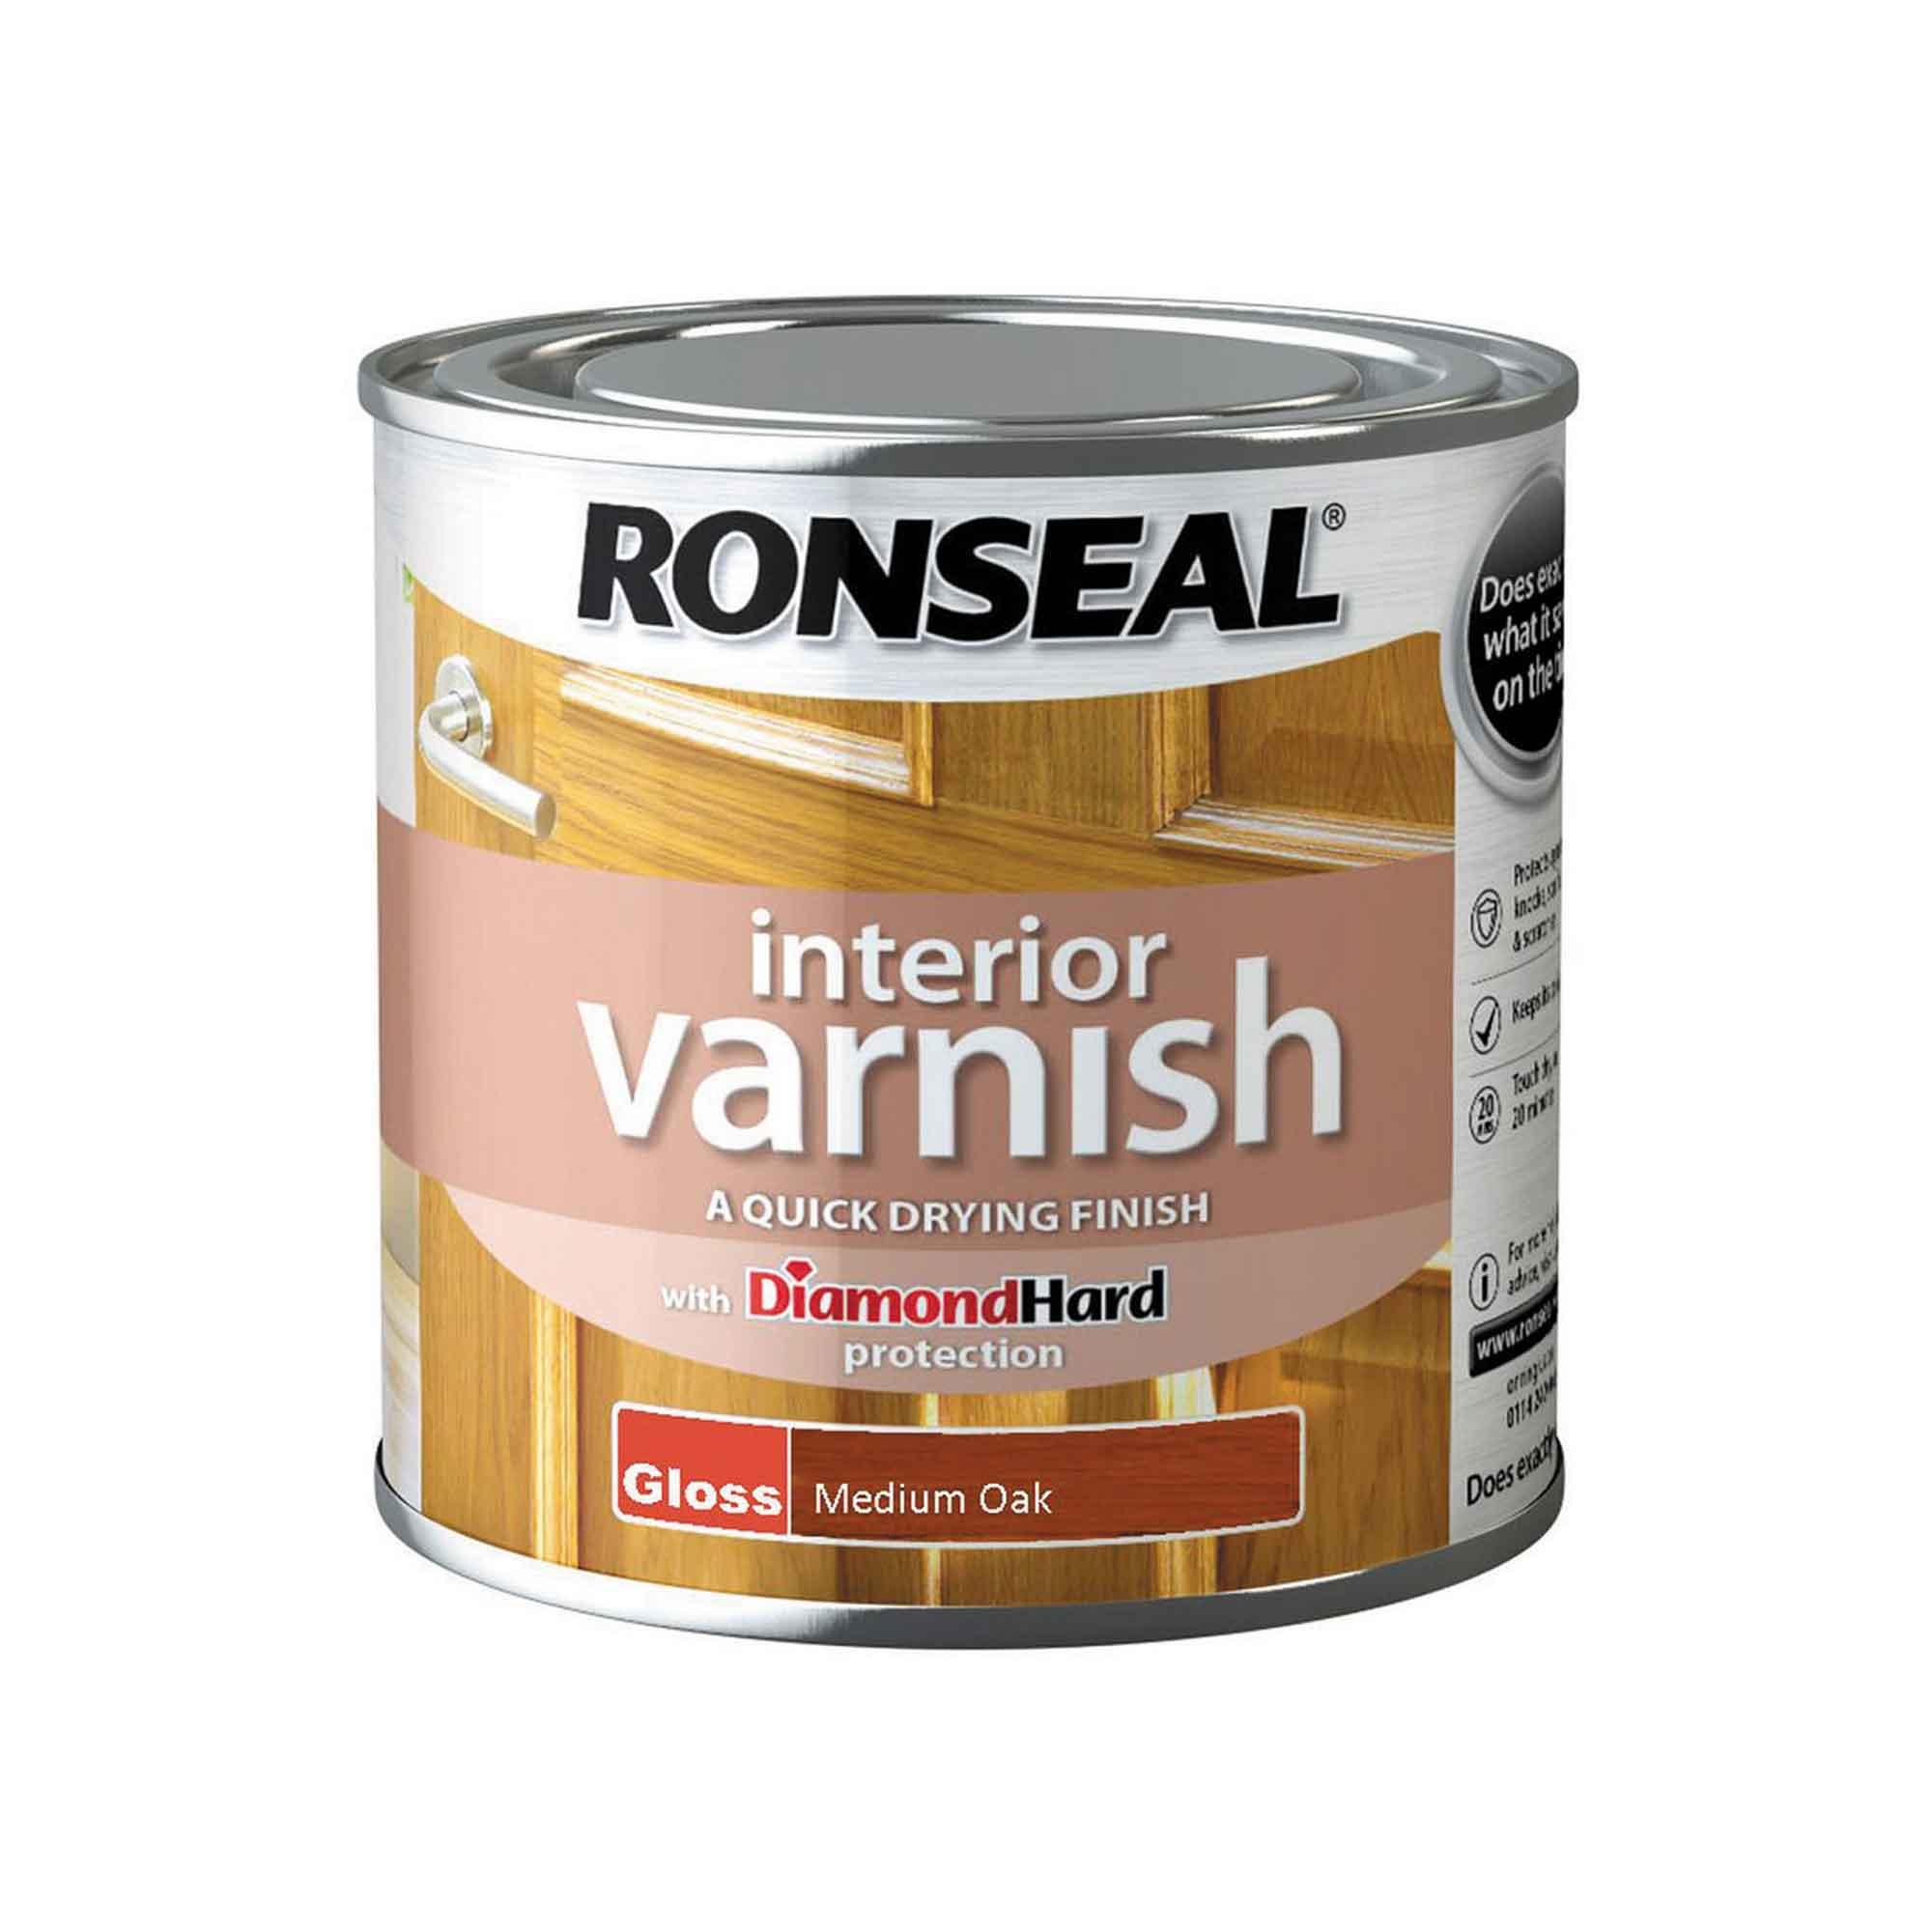 Ronseal Diamond Hard Interior Varnish Gloss Medium Oak 250ml